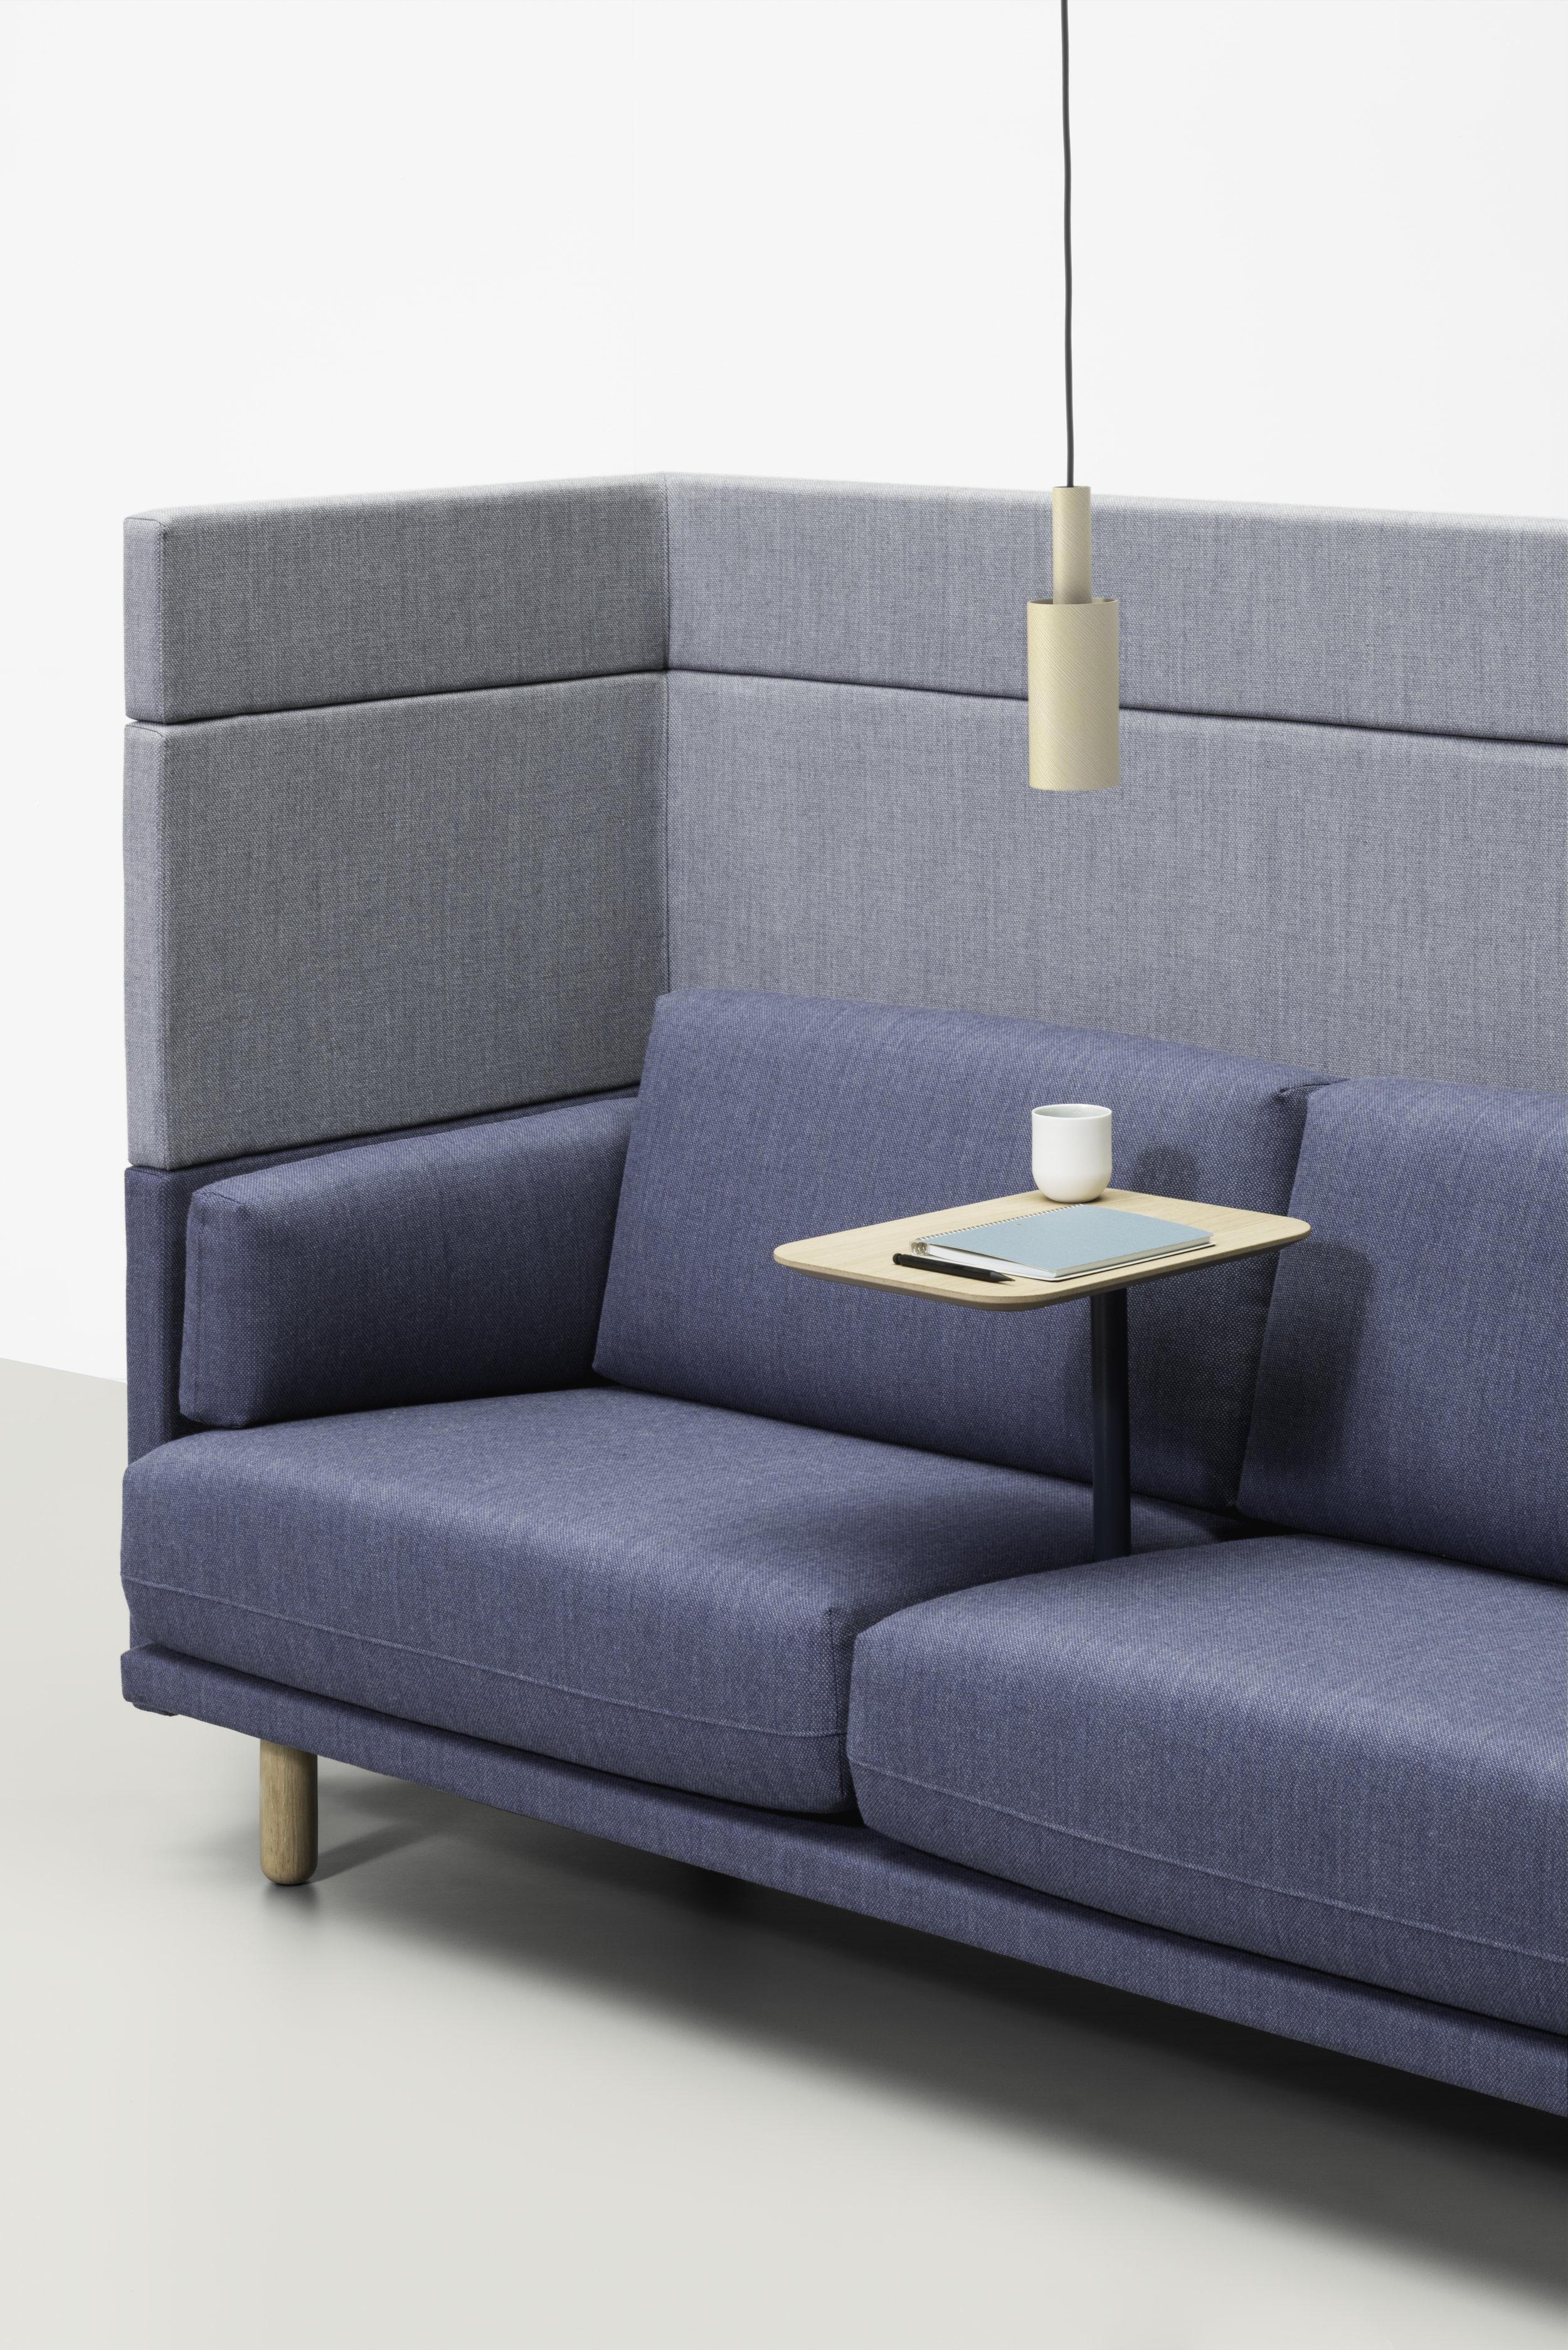 Arnhem-Sofa von DeVorm